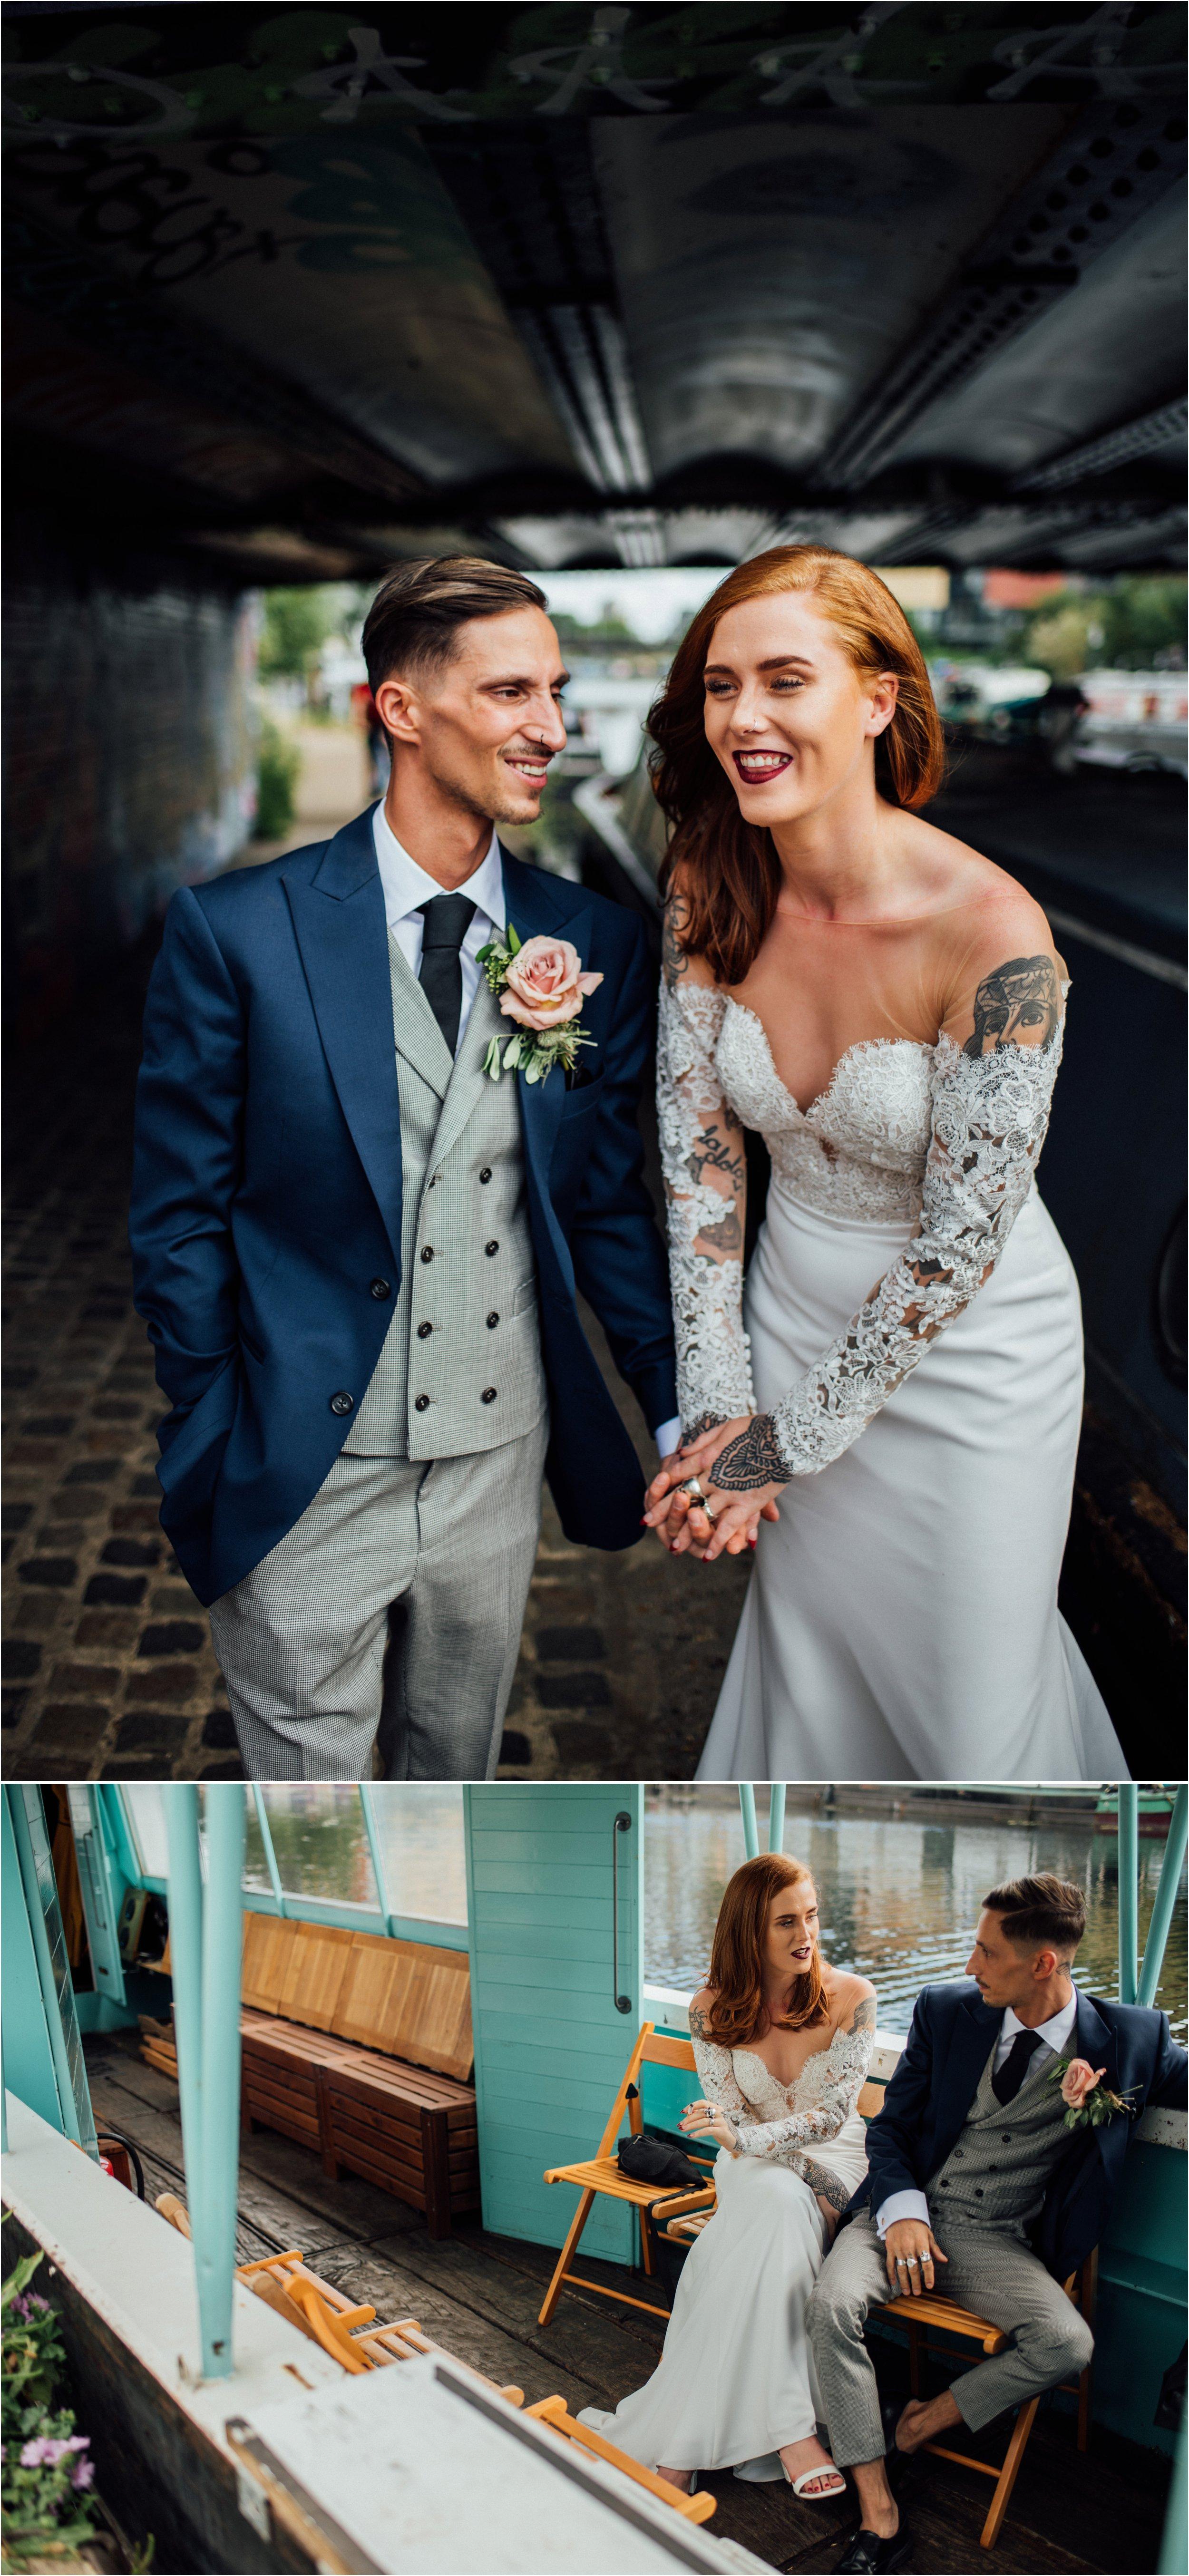 Hackney town hall wedding photography_0141.jpg